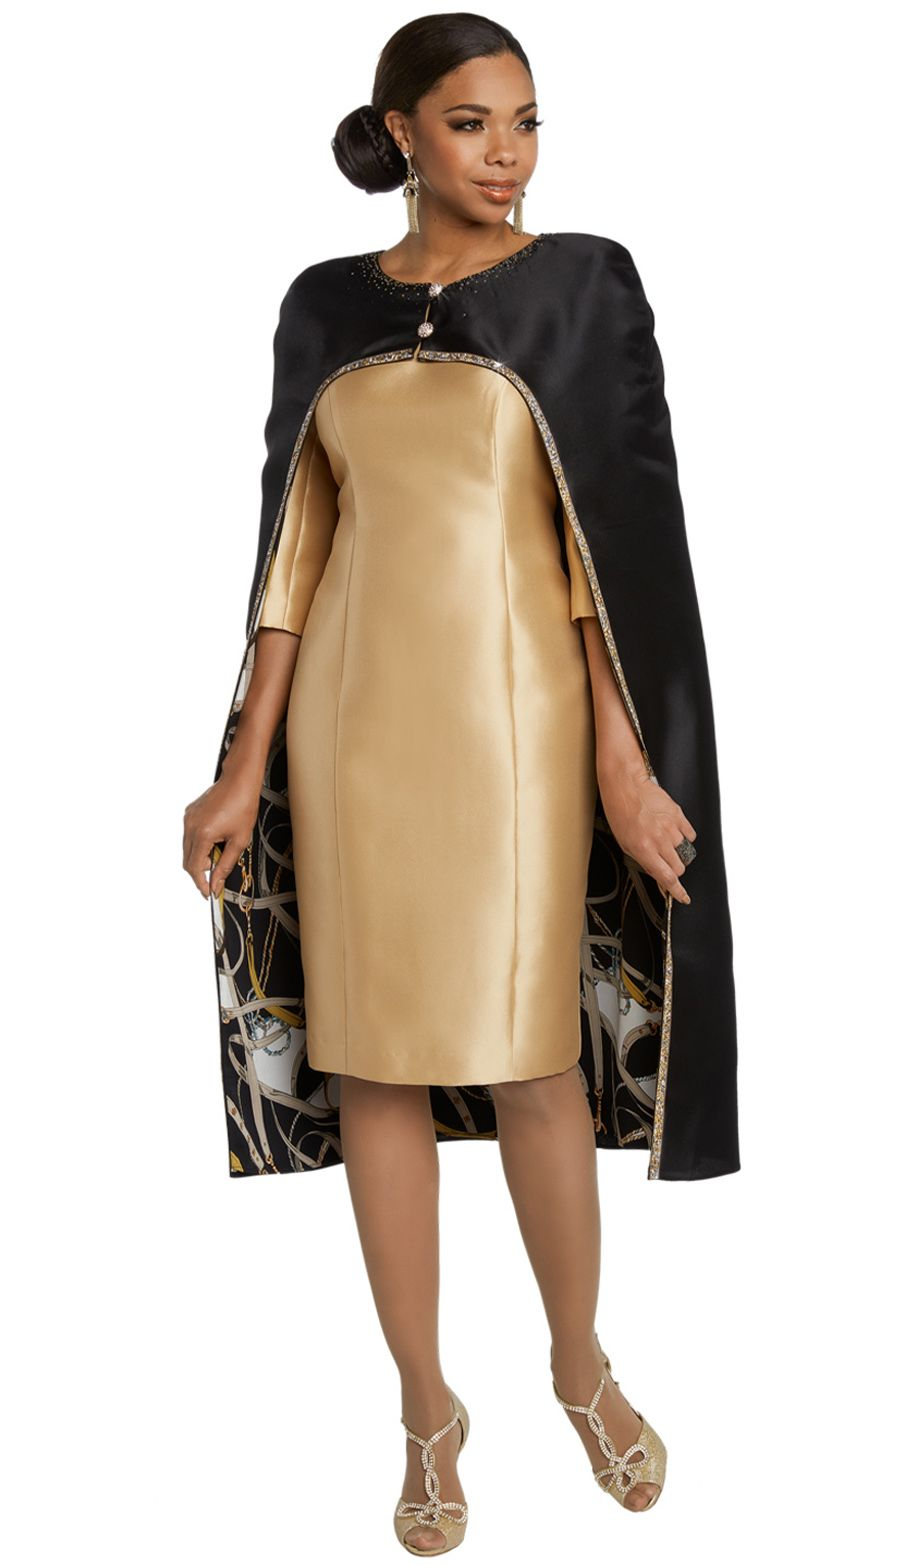 Neon Coral Summer Dress Affordable Modest Boutique Clothes For Women Trendy Modest Church Dresses For Wo Coral Summer Dresses Summer Dresses Modest Dresses [ 1105 x 736 Pixel ]